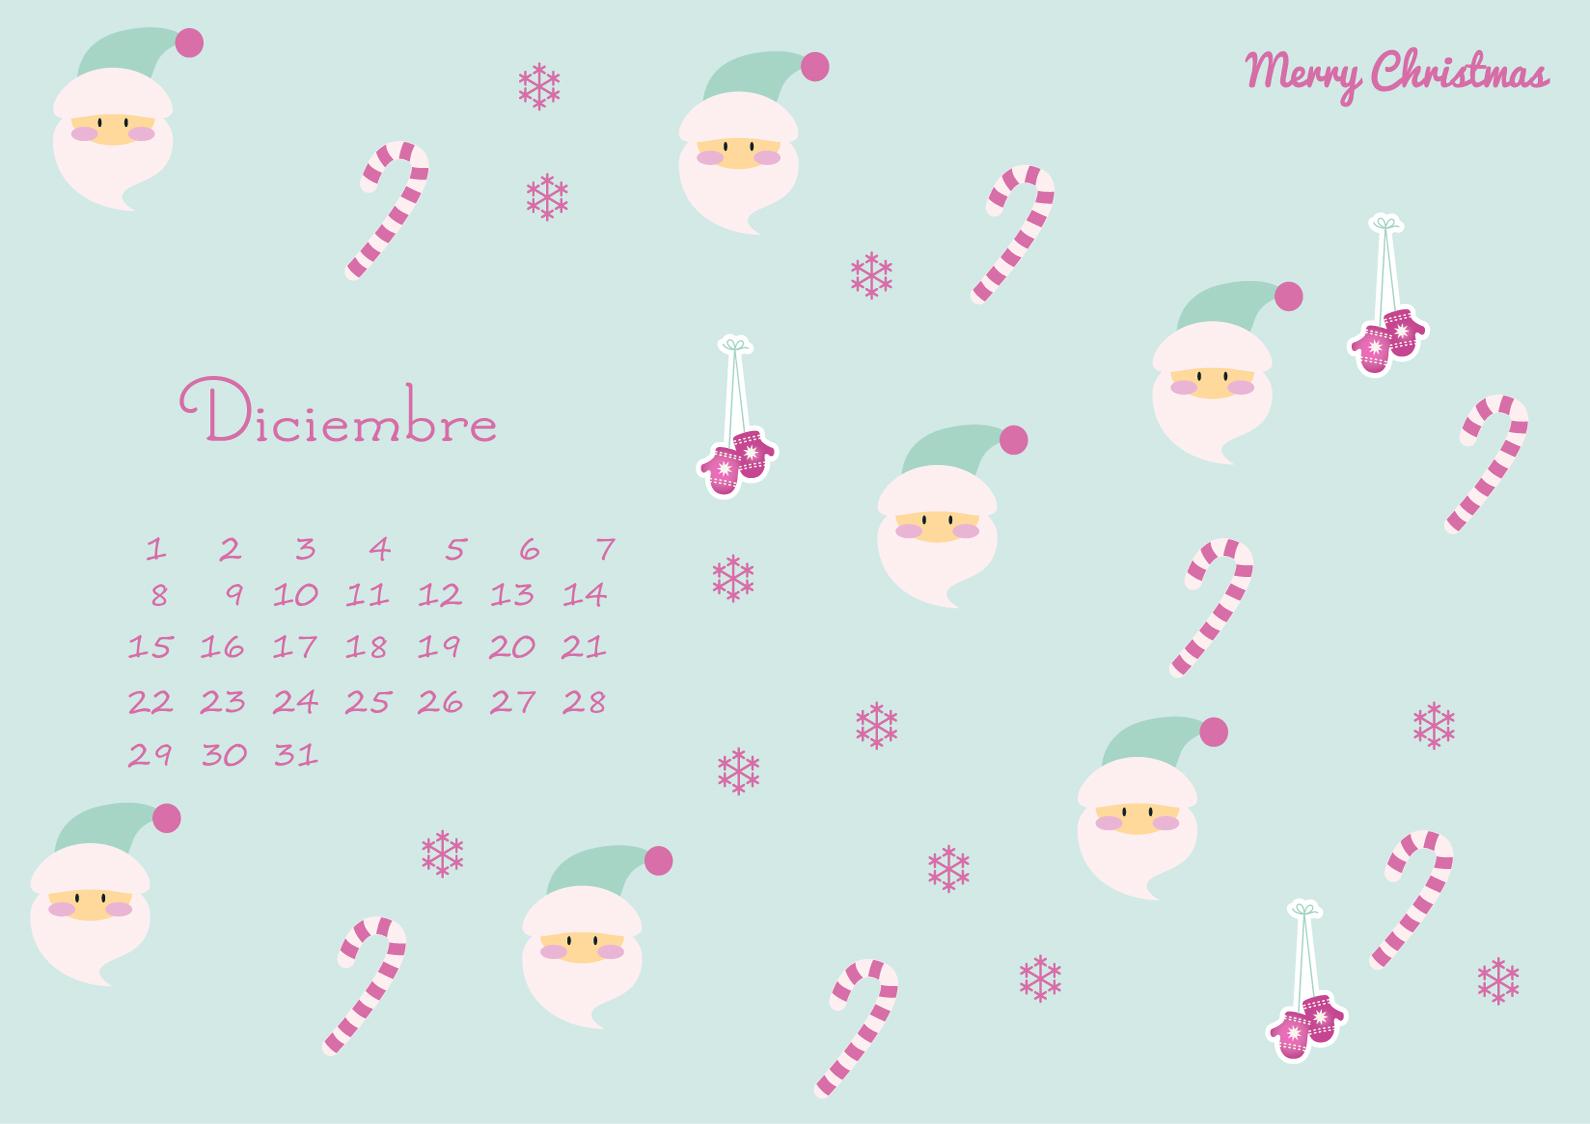 Calendario De Diciembre 2014, Fondo De Pantalla Y